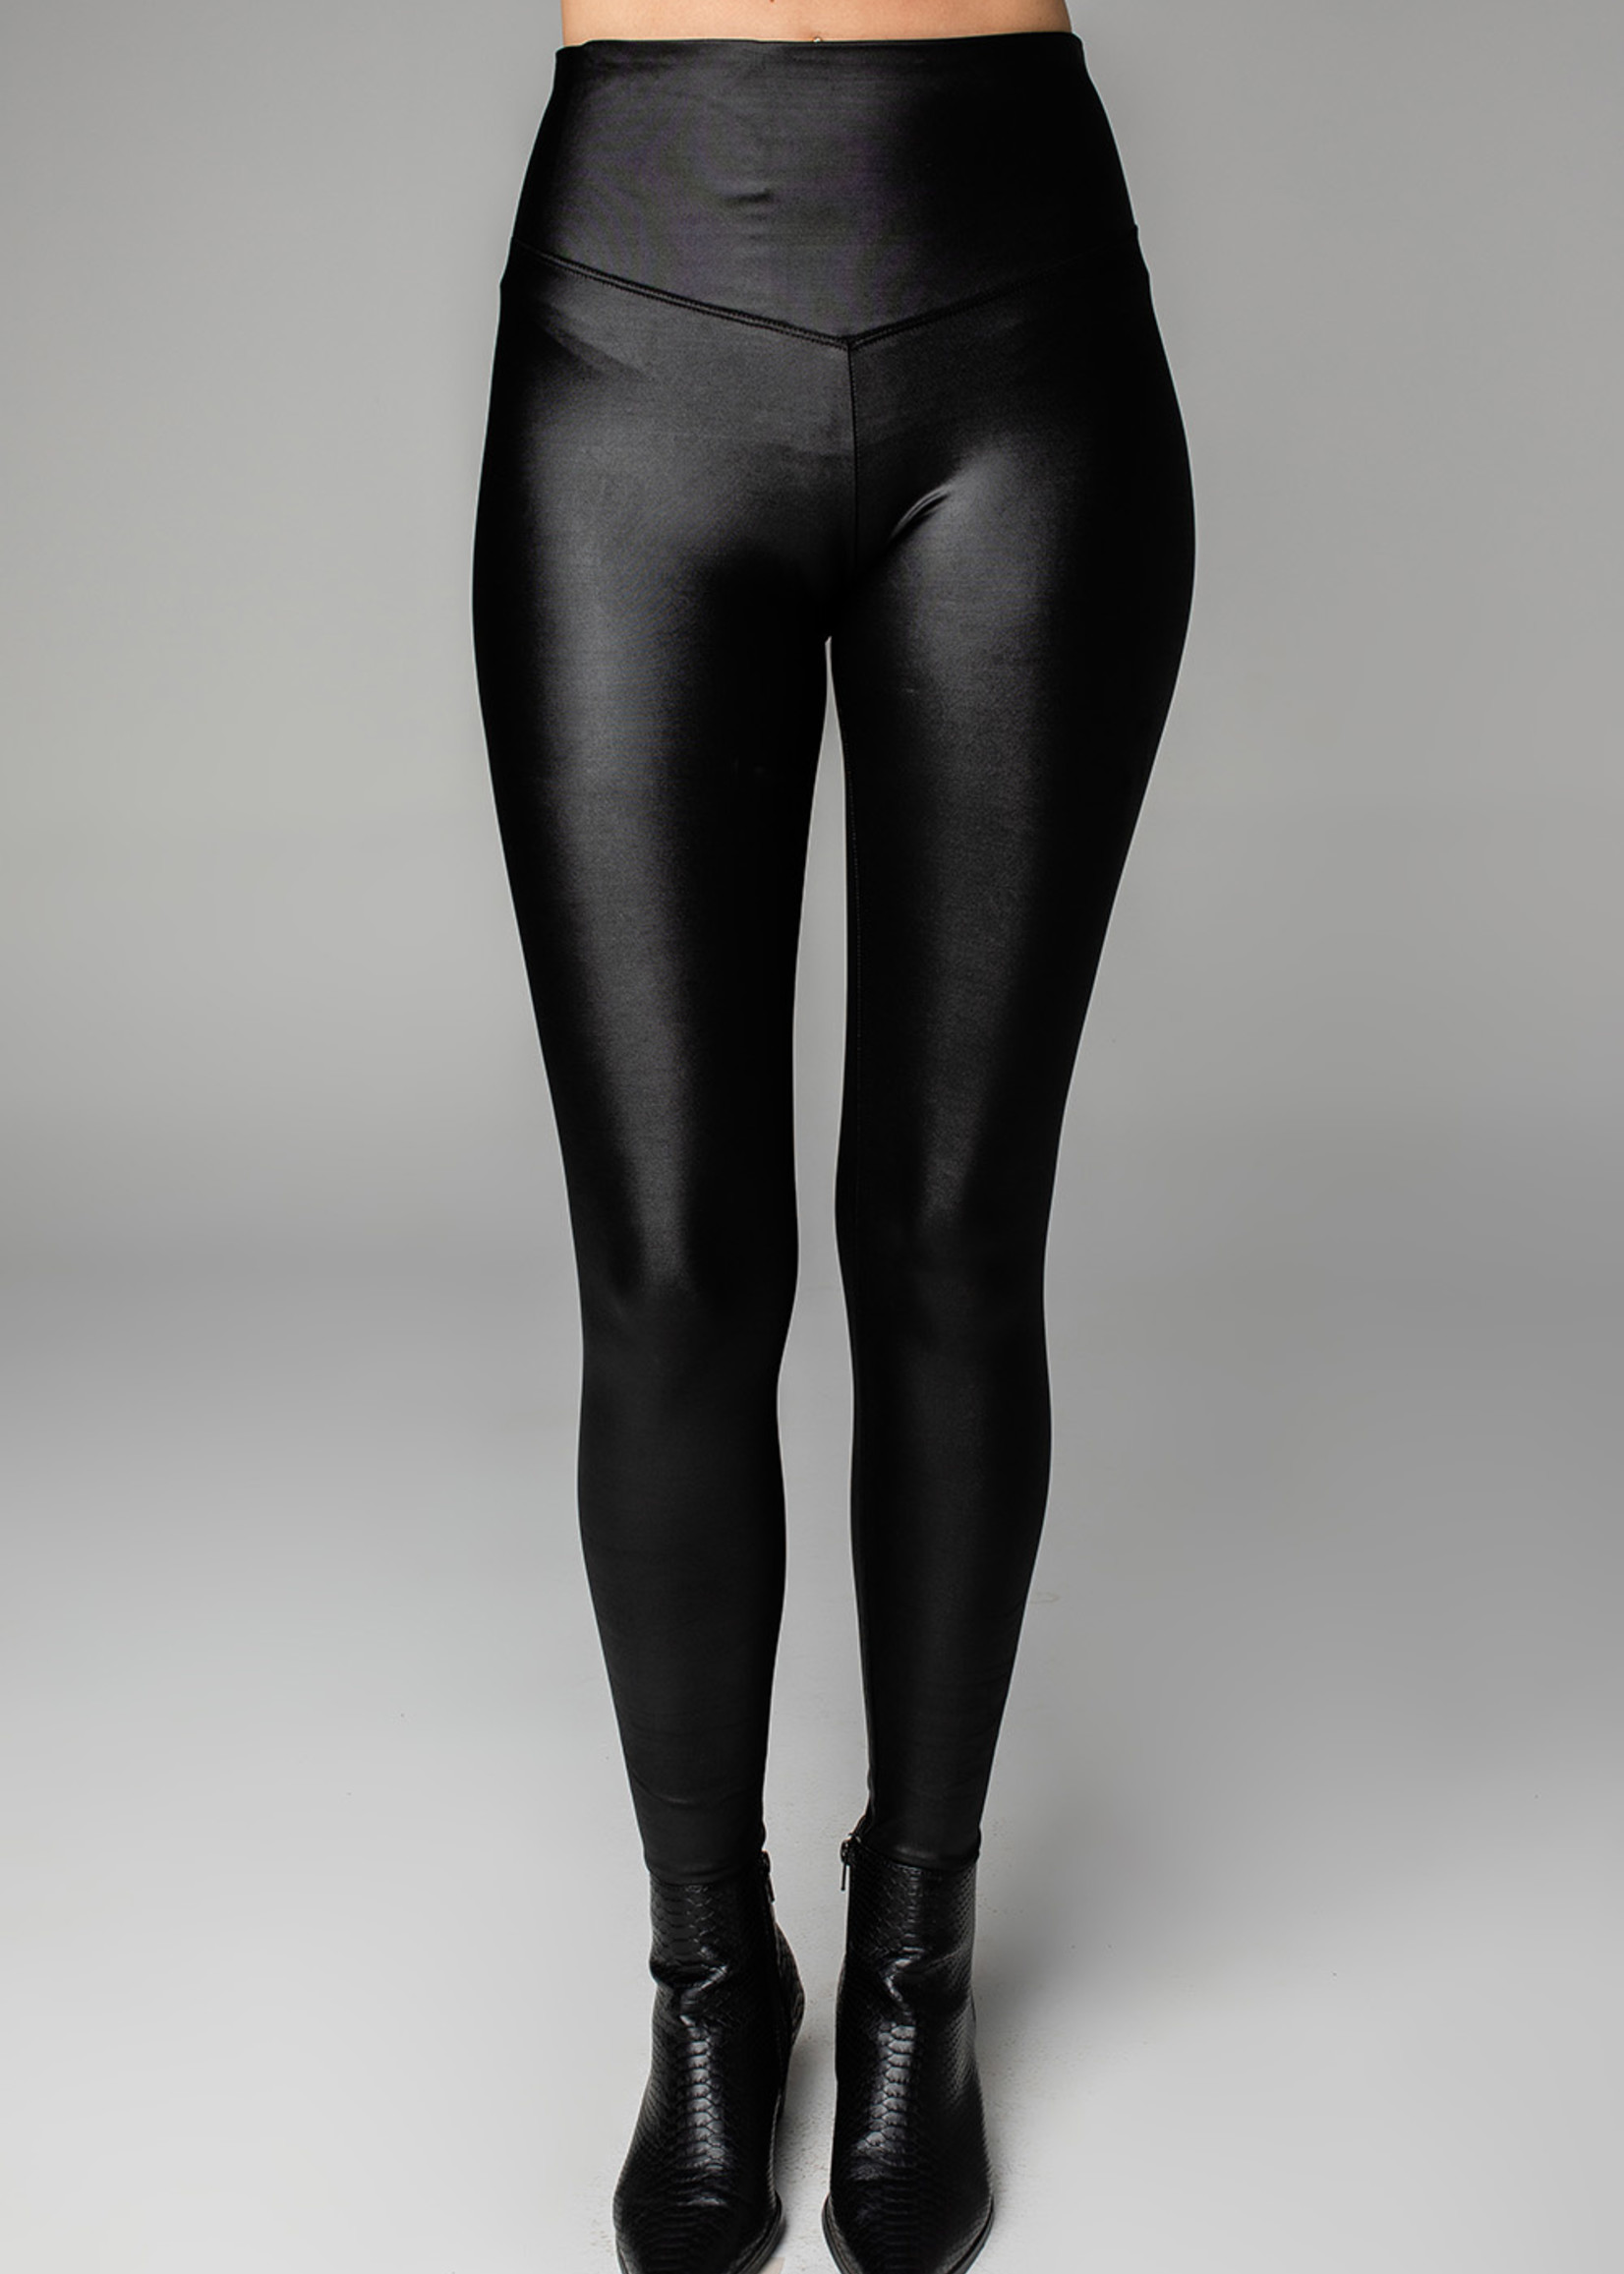 Buddy Love Jillian Black Faux Leather Pants